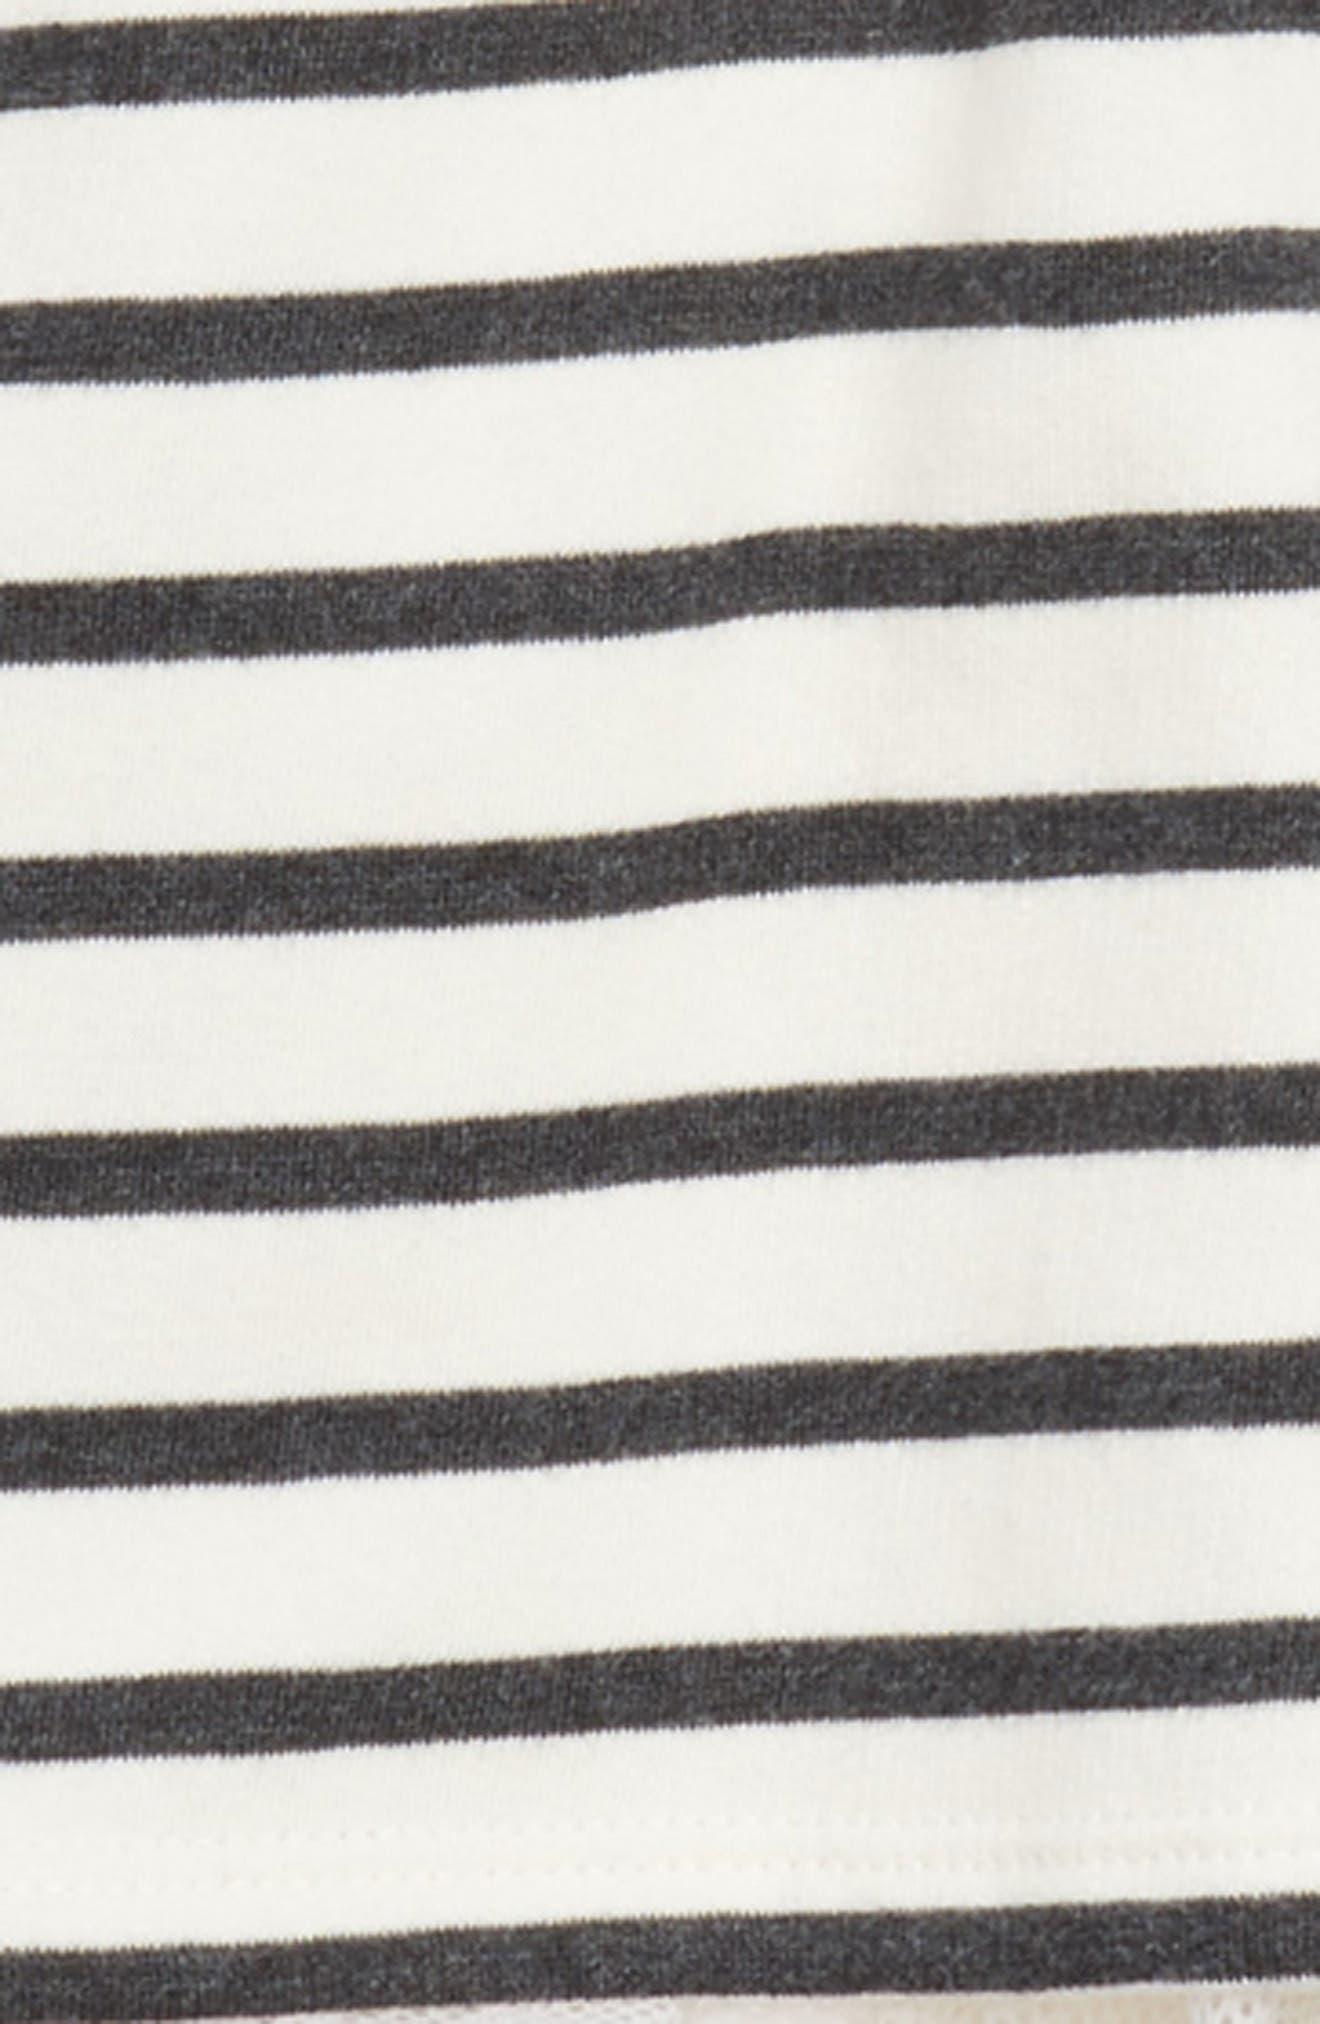 Stripe Crop Hooded Sweatshirt with Back Ruffle,                             Alternate thumbnail 2, color,                             160